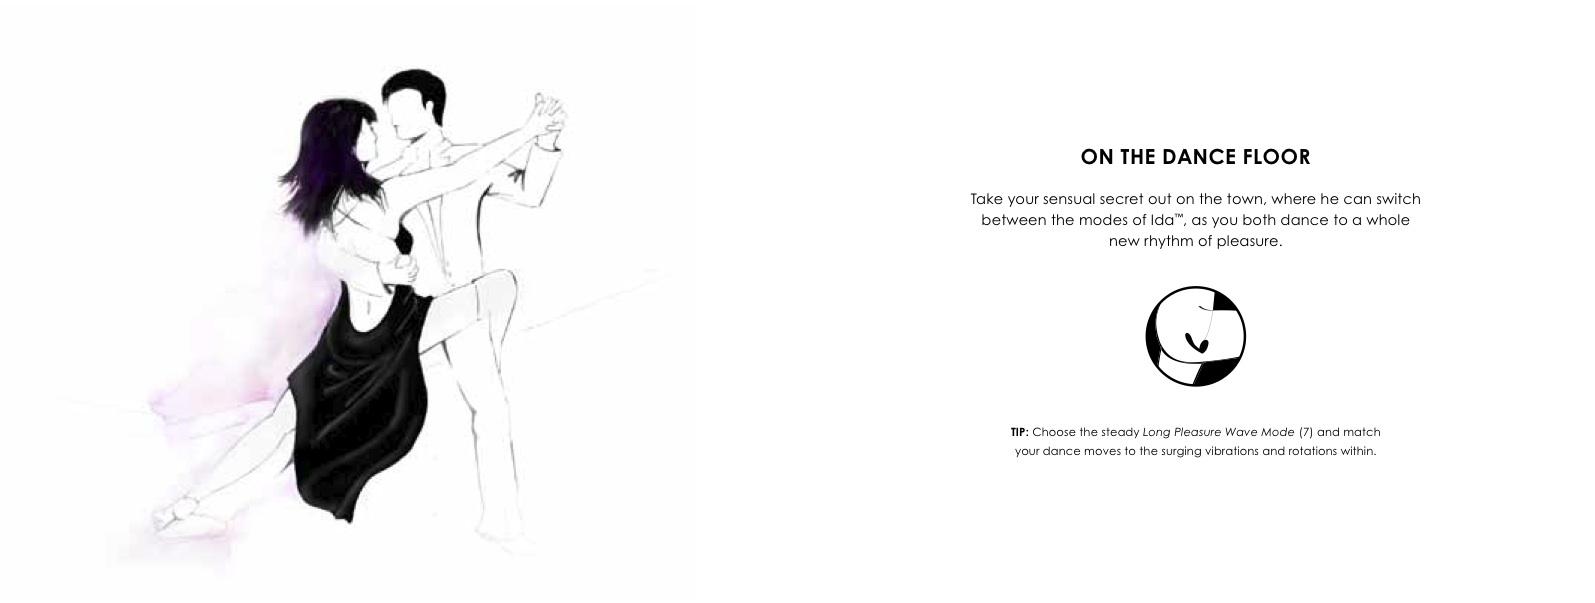 7-IDA_lovers-guide_mouvements_commande_plaisir_sensuels.jpg